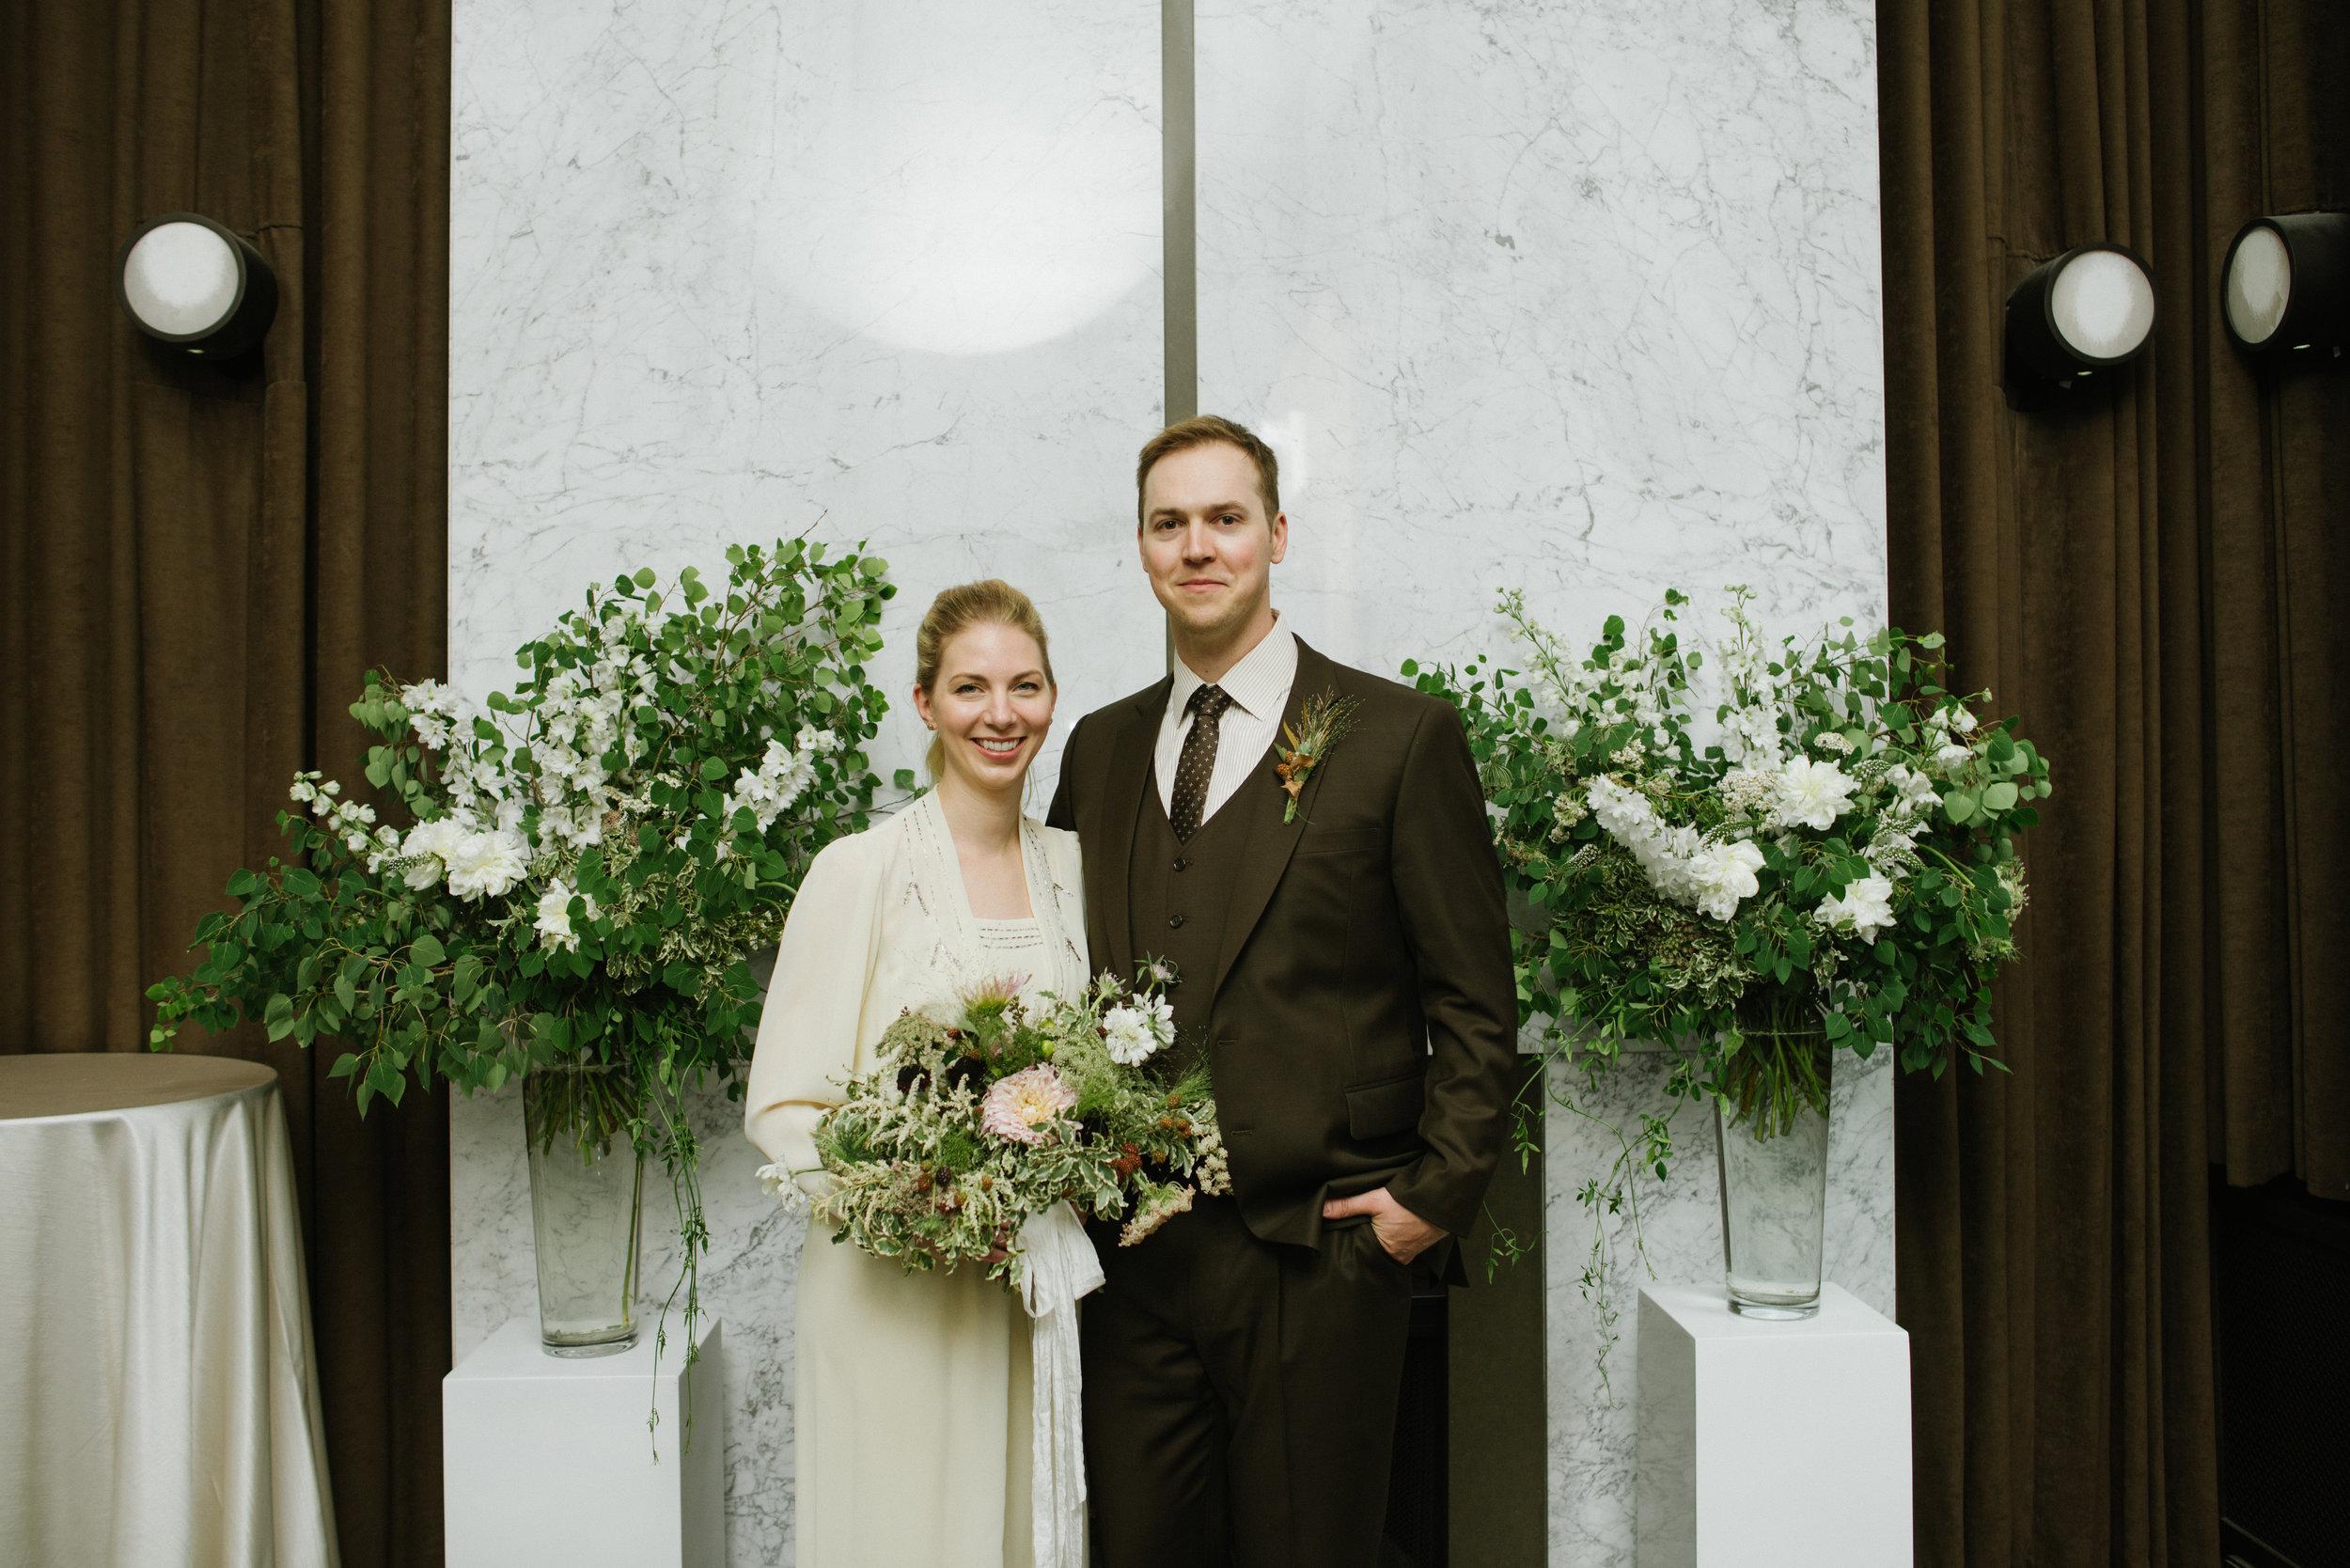 Teatro_Wedding_Calgary_Wedding_Photography_Vanessa_Tom_Married_2018_HR302.jpg